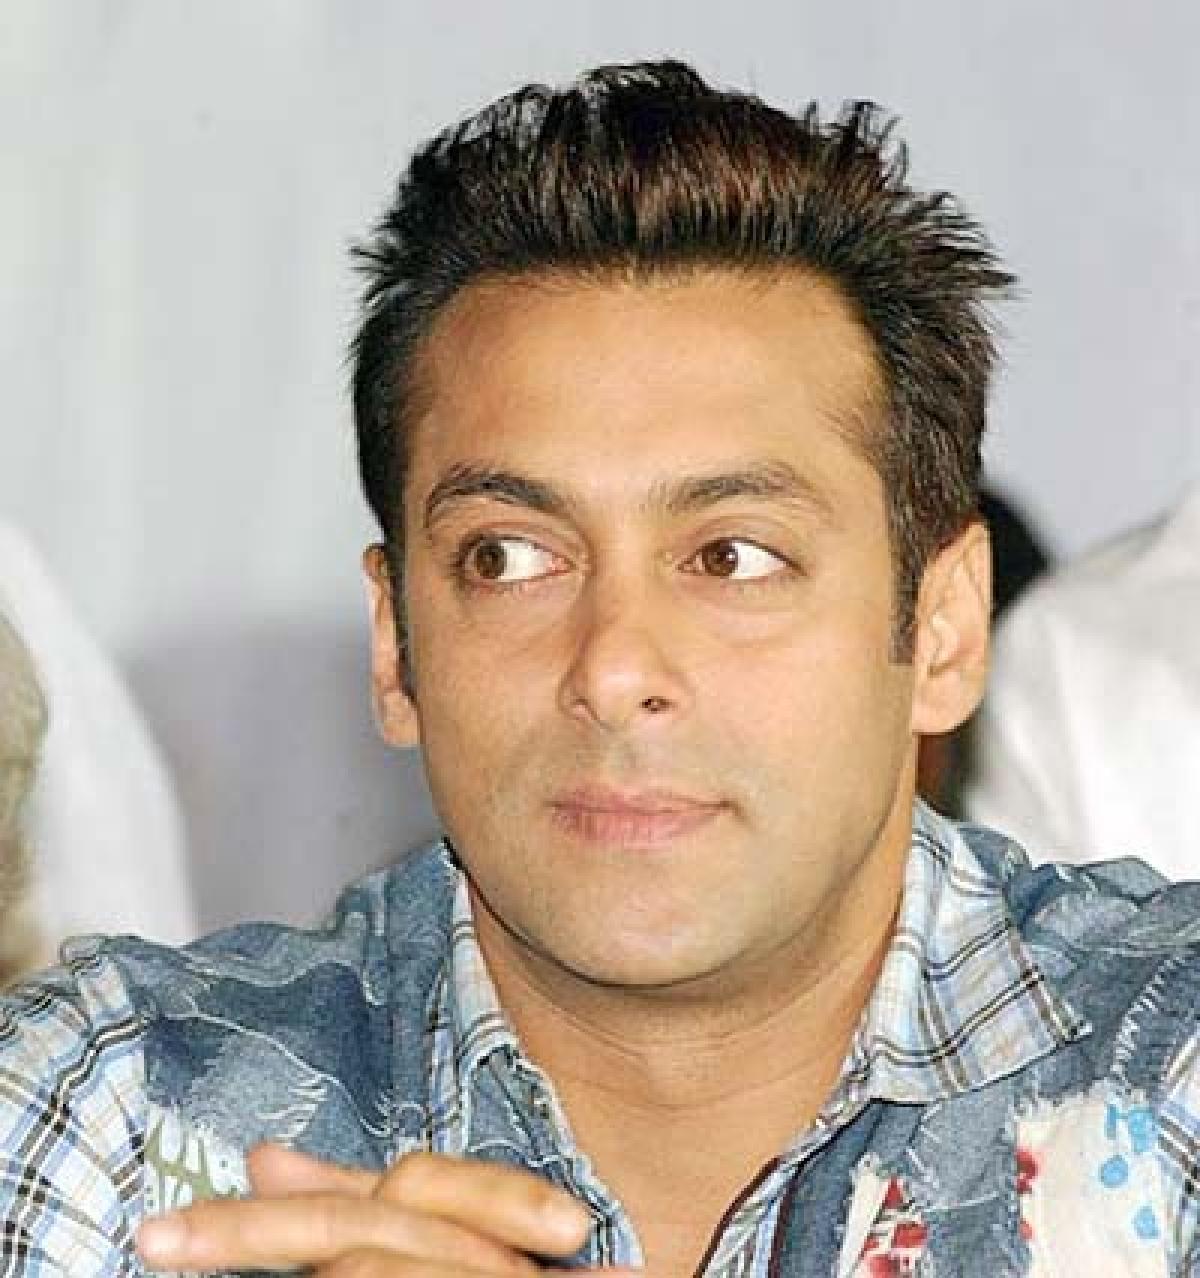 Salman Khan, actor poses for the photographers in Mumbai, Maharashtra, India